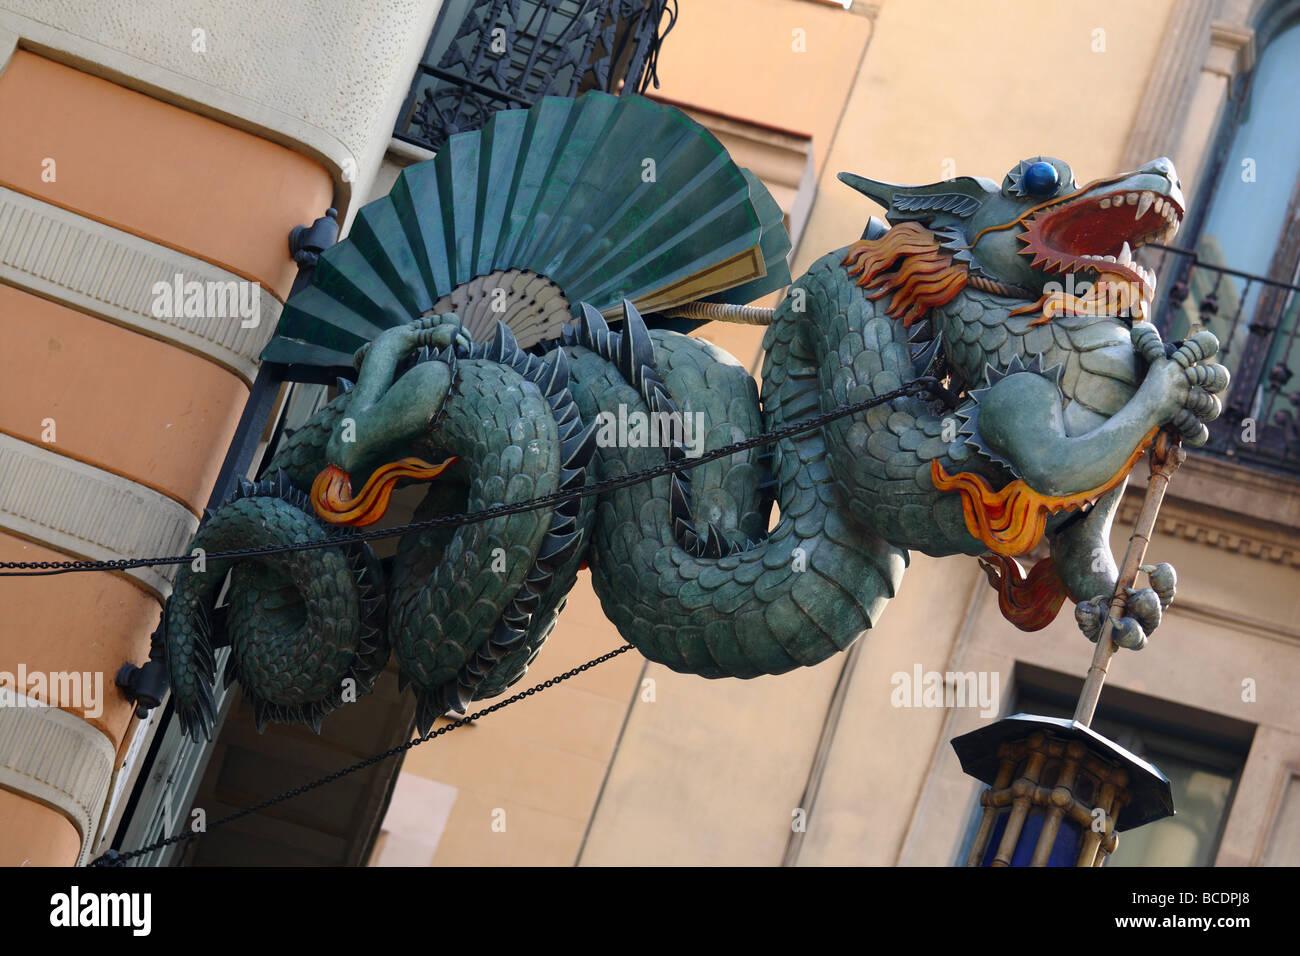 Dragon La Rambla Barcelona Catalunya Spain - Stock Image